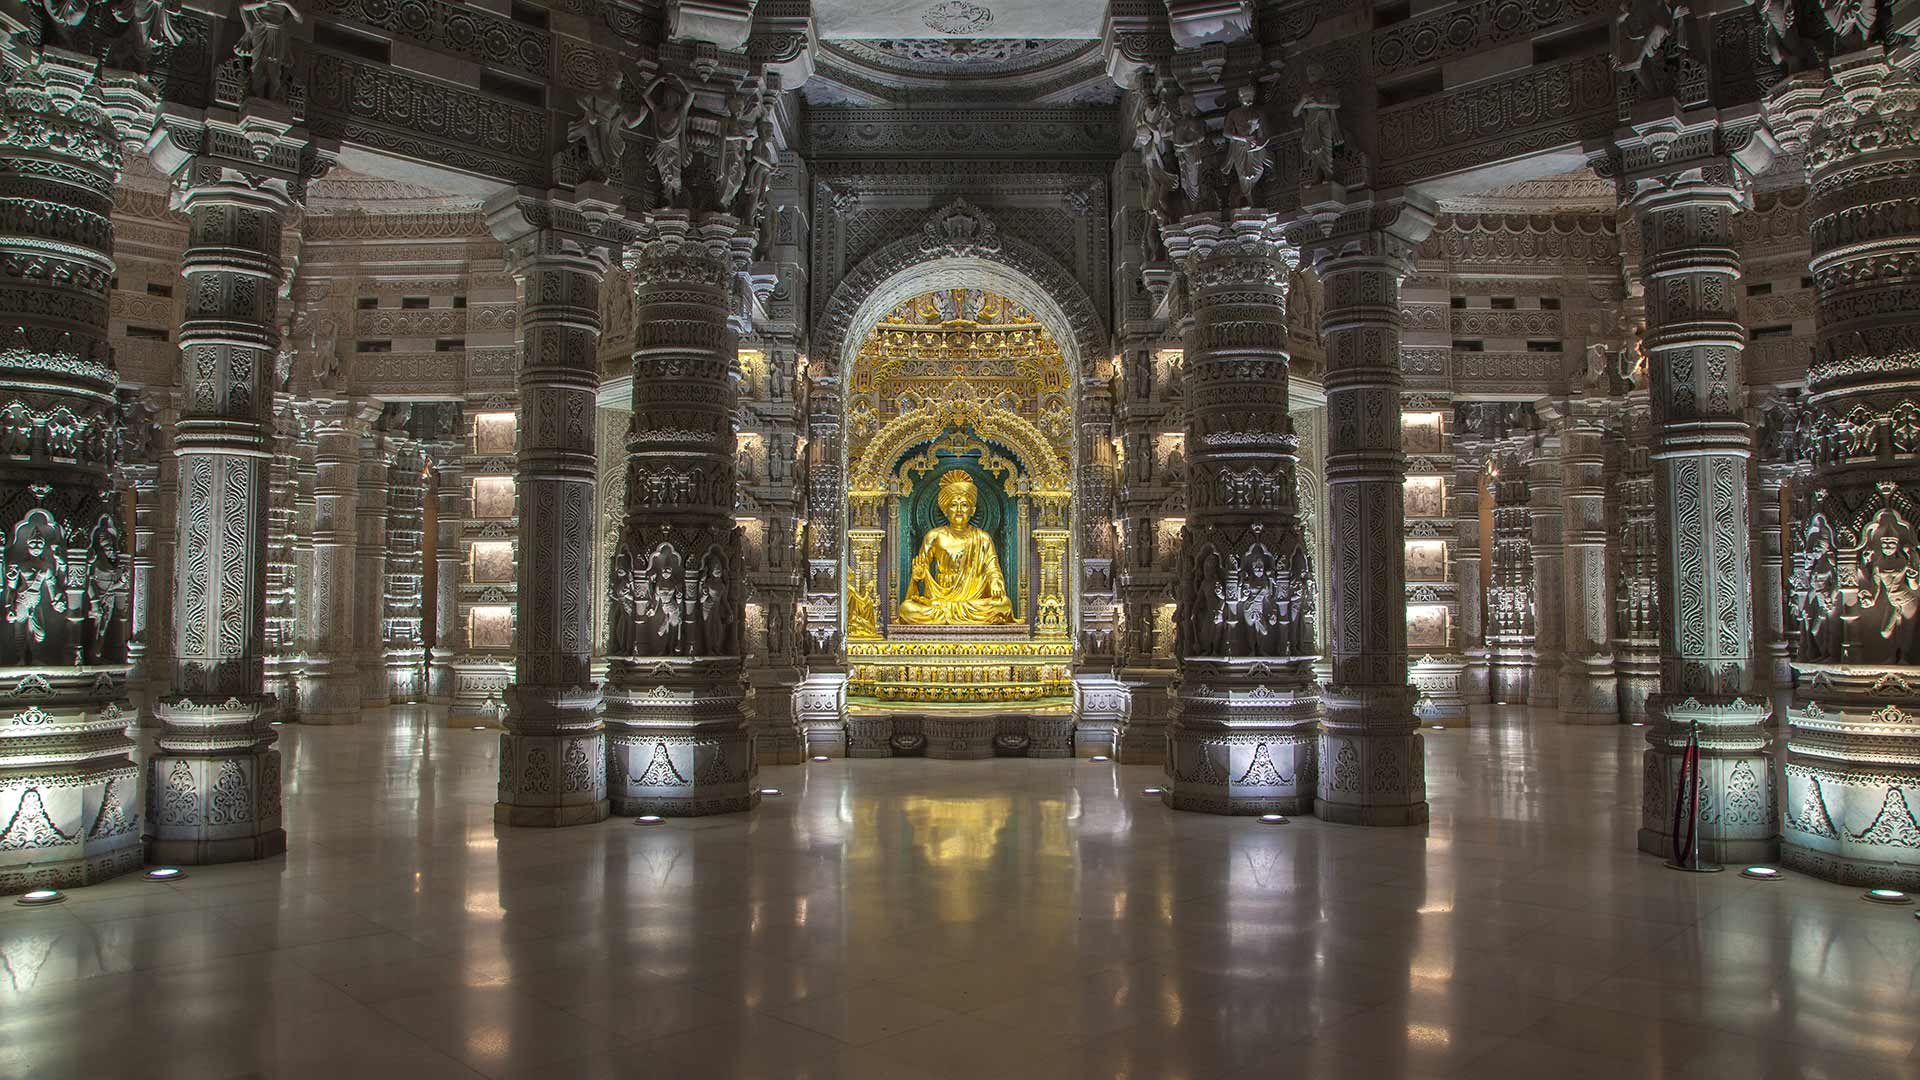 Diwali Hd Wallpaper Download Garbhagruh Pictures Swaminarayan Akshardham New Delhi